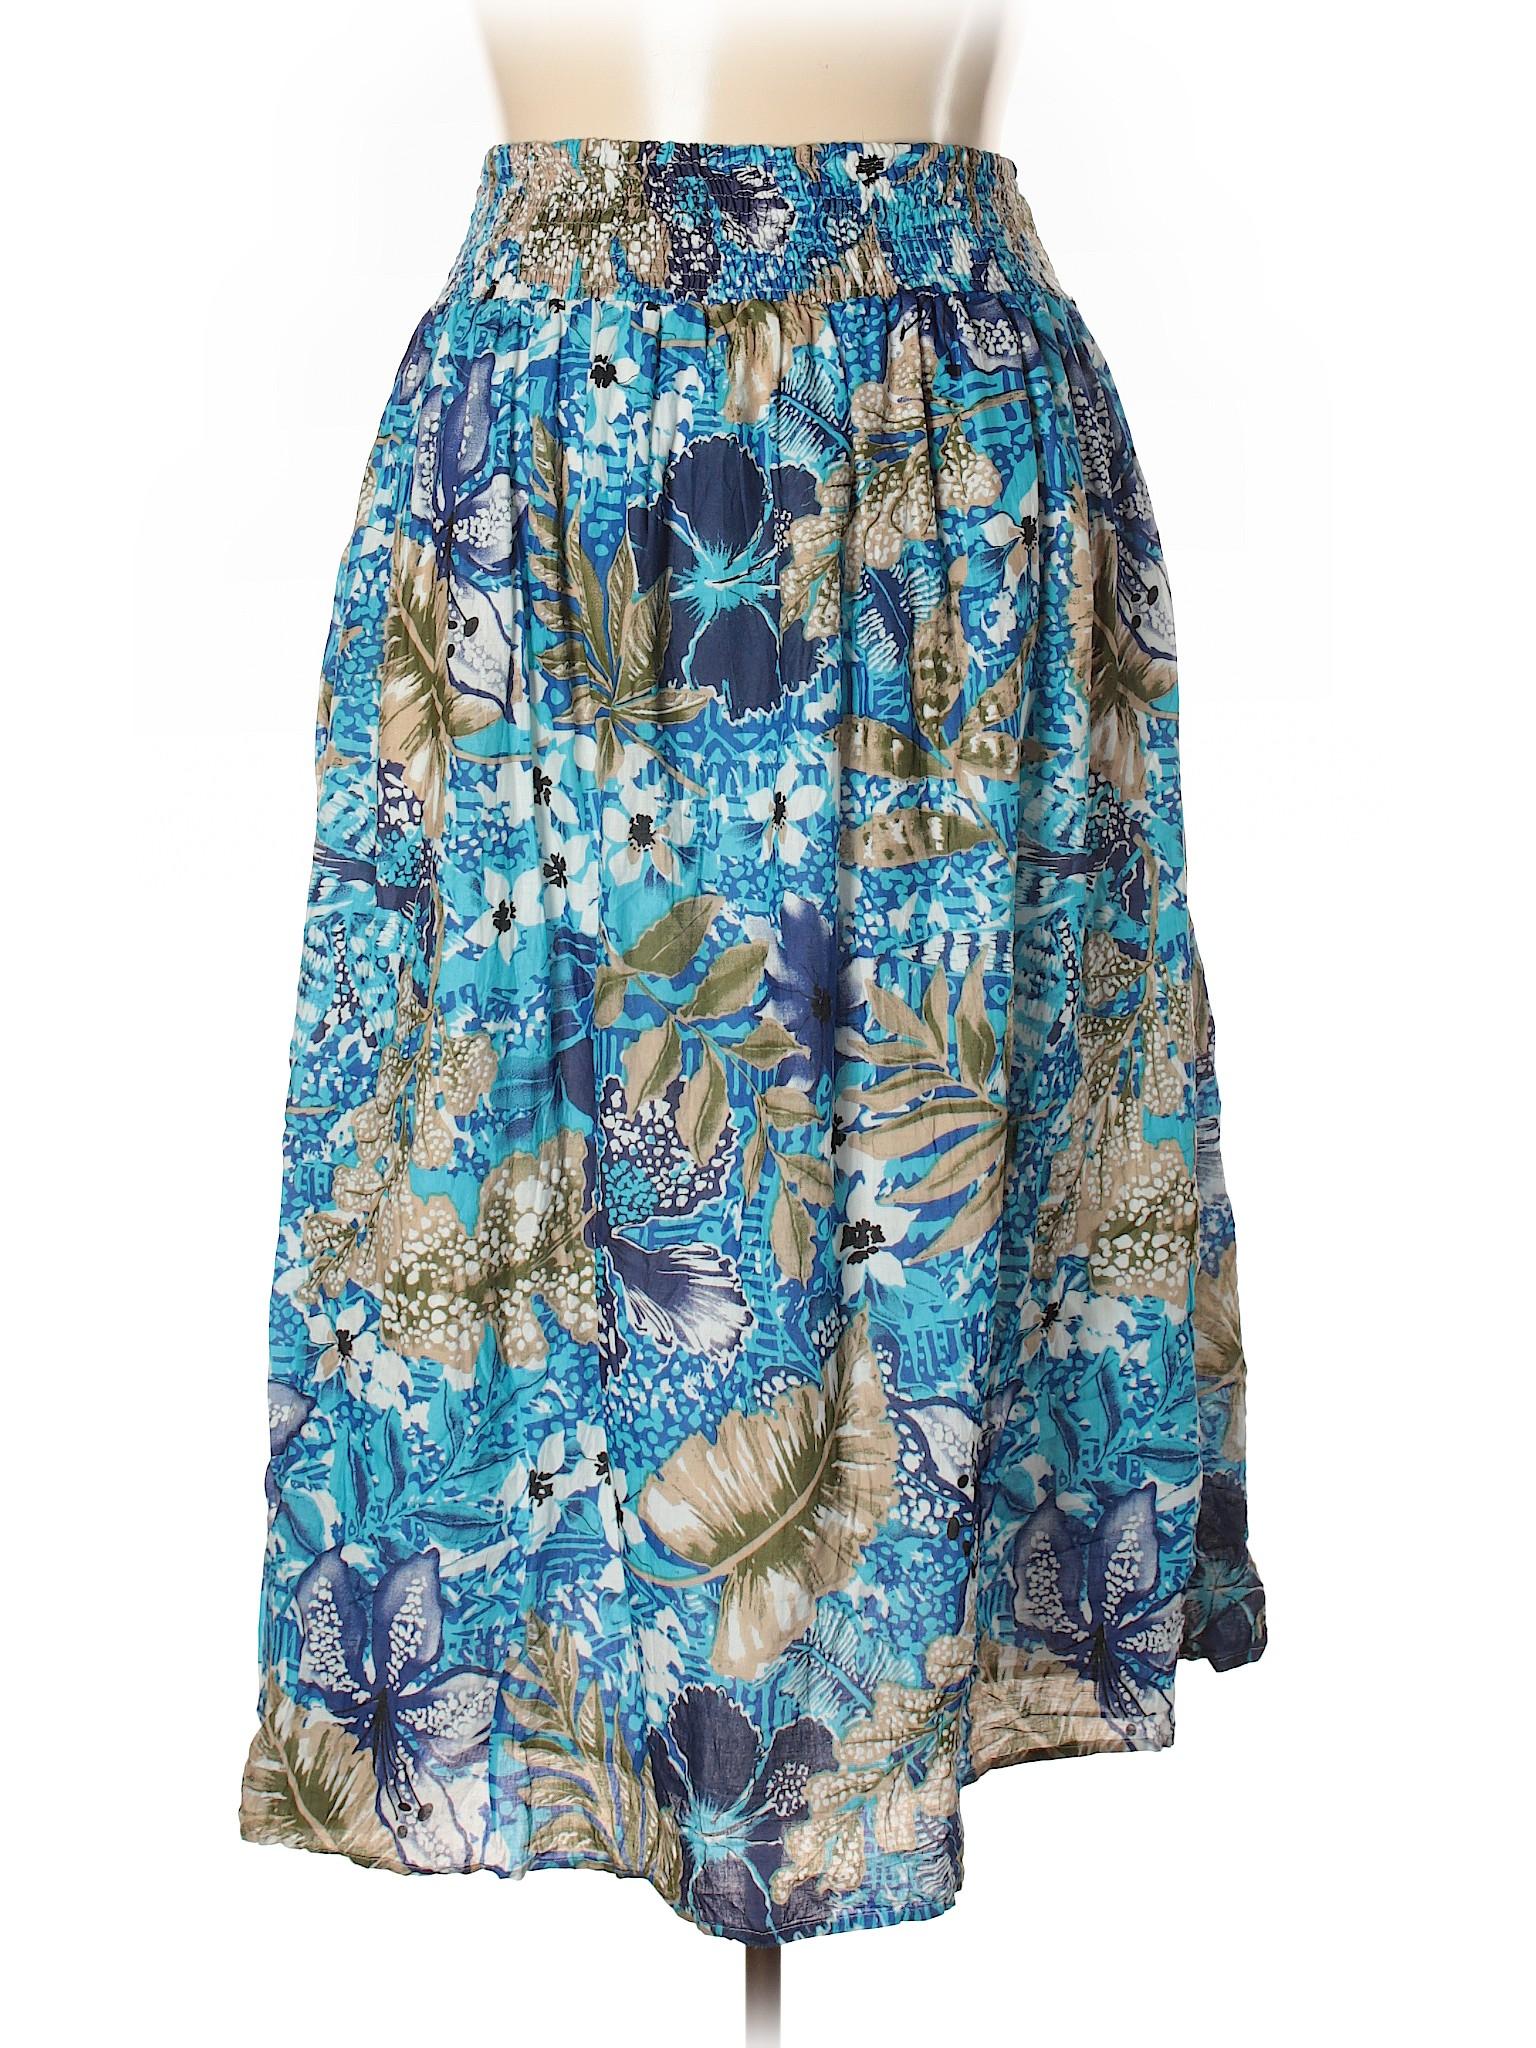 Stewart Casual Ashley Ashley Boutique Stewart Boutique Skirt Casual xXwqxv4